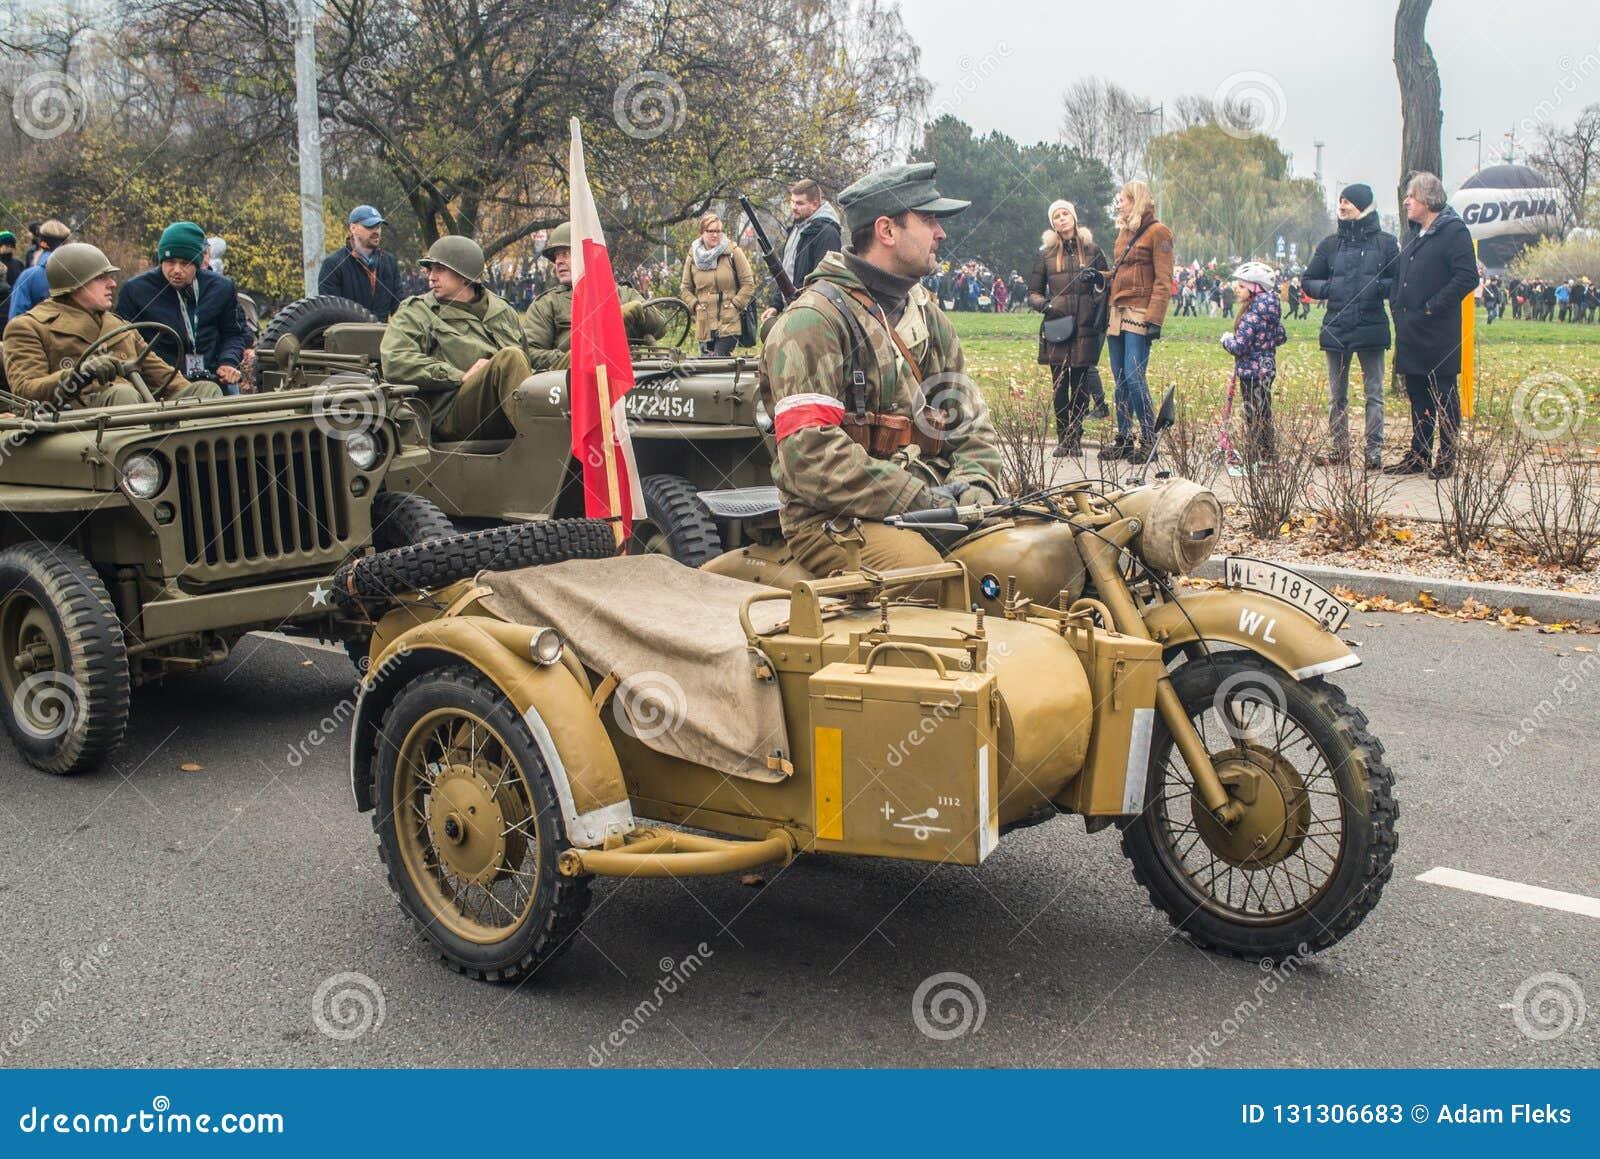 Vintage Military Motorbike Editorial Stock Photo Image Of Engine 131306683